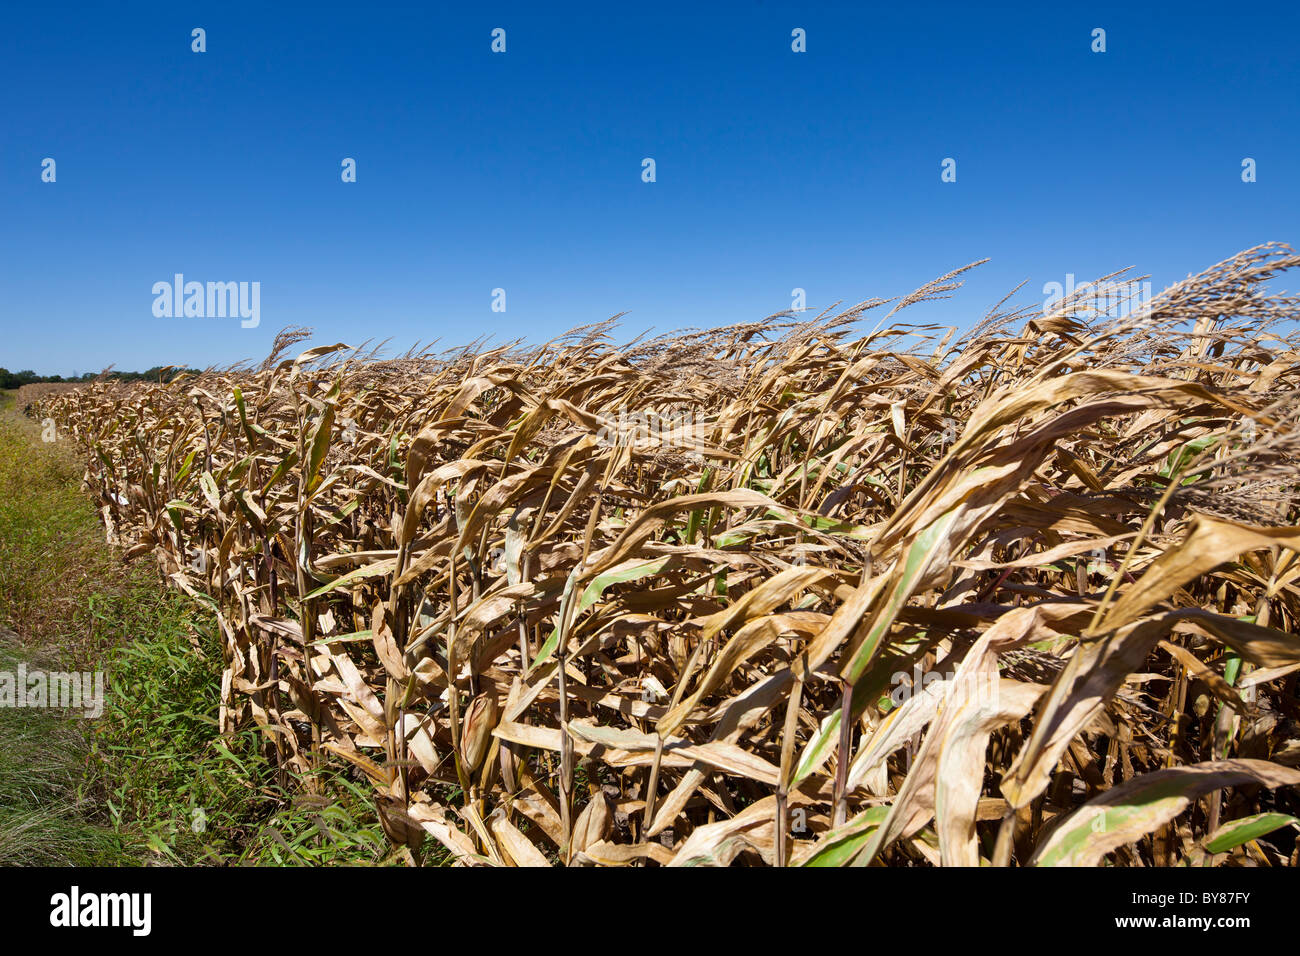 Campo de trigo maduro, Plano, Kendall County, Illinois, EE.UU. Foto de stock